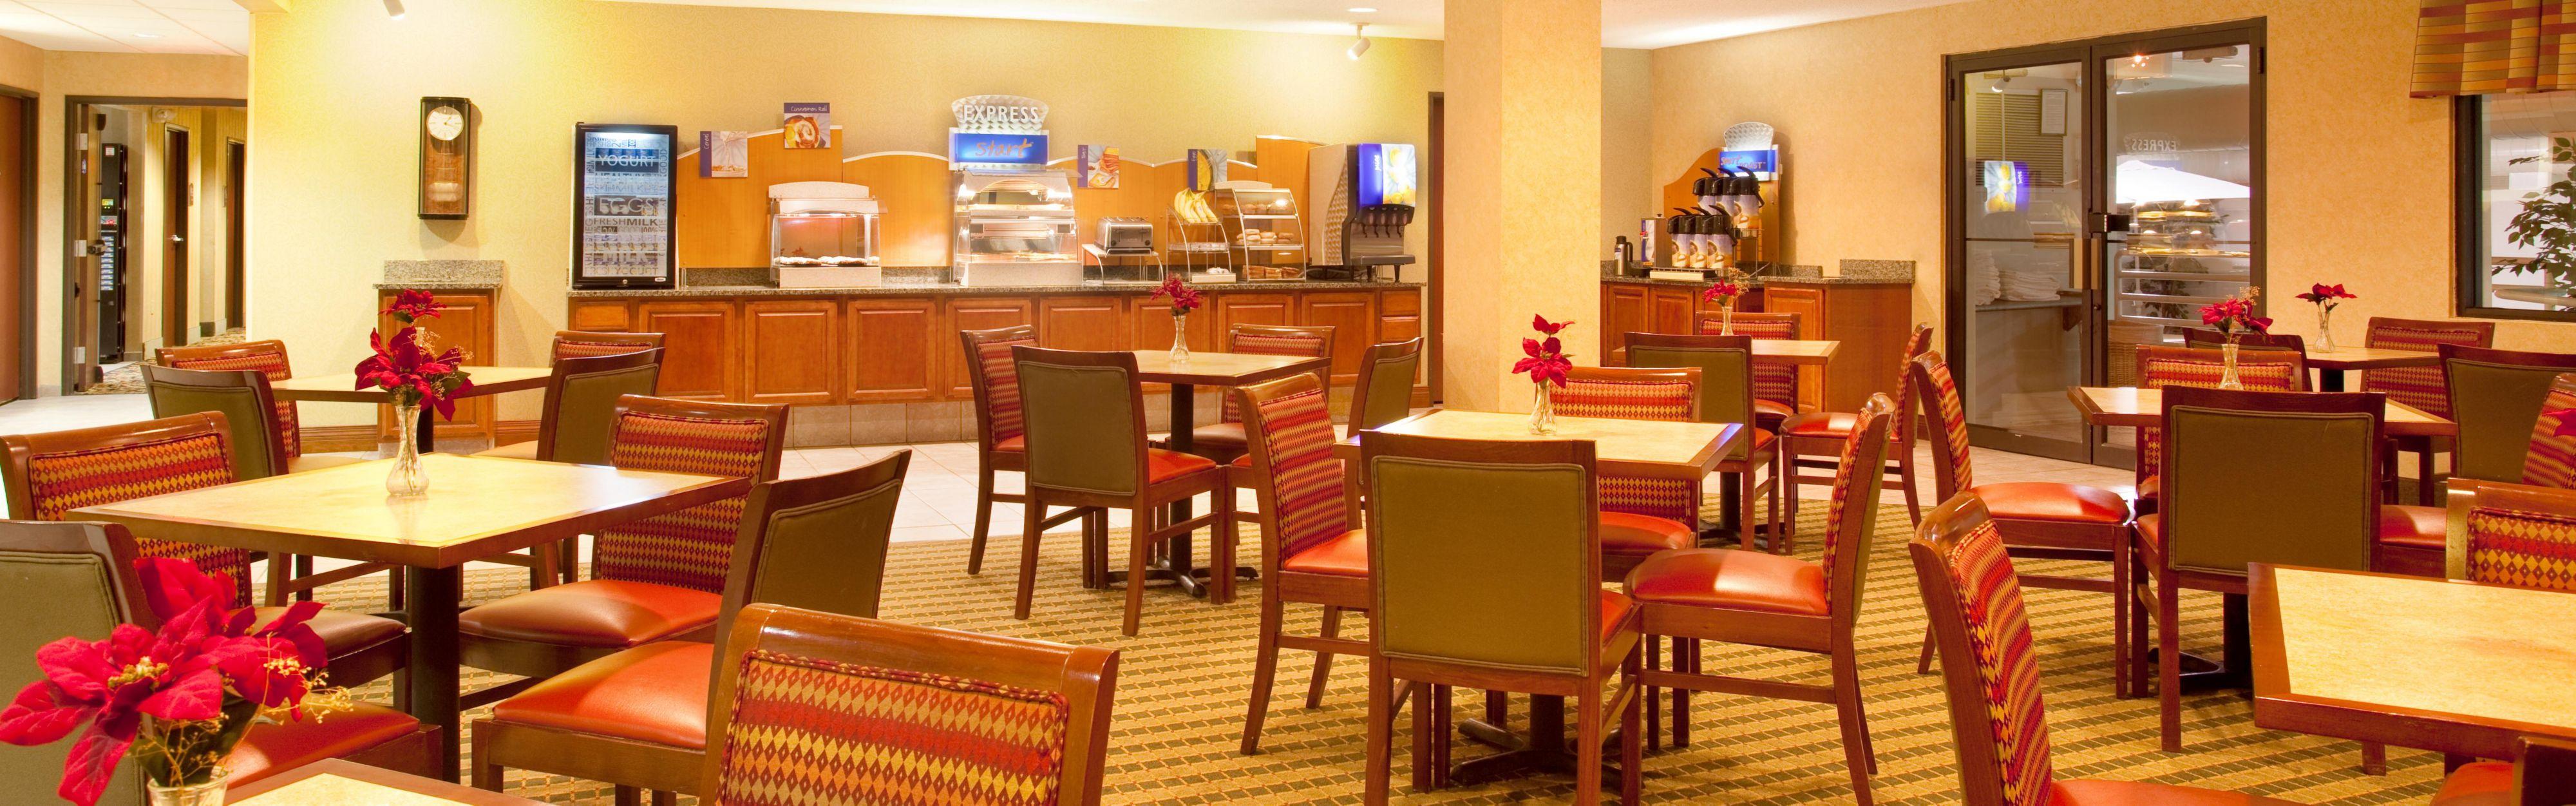 Holiday Inn Express & Suites Bourbonnais (Kankakee/Bradley) image 3